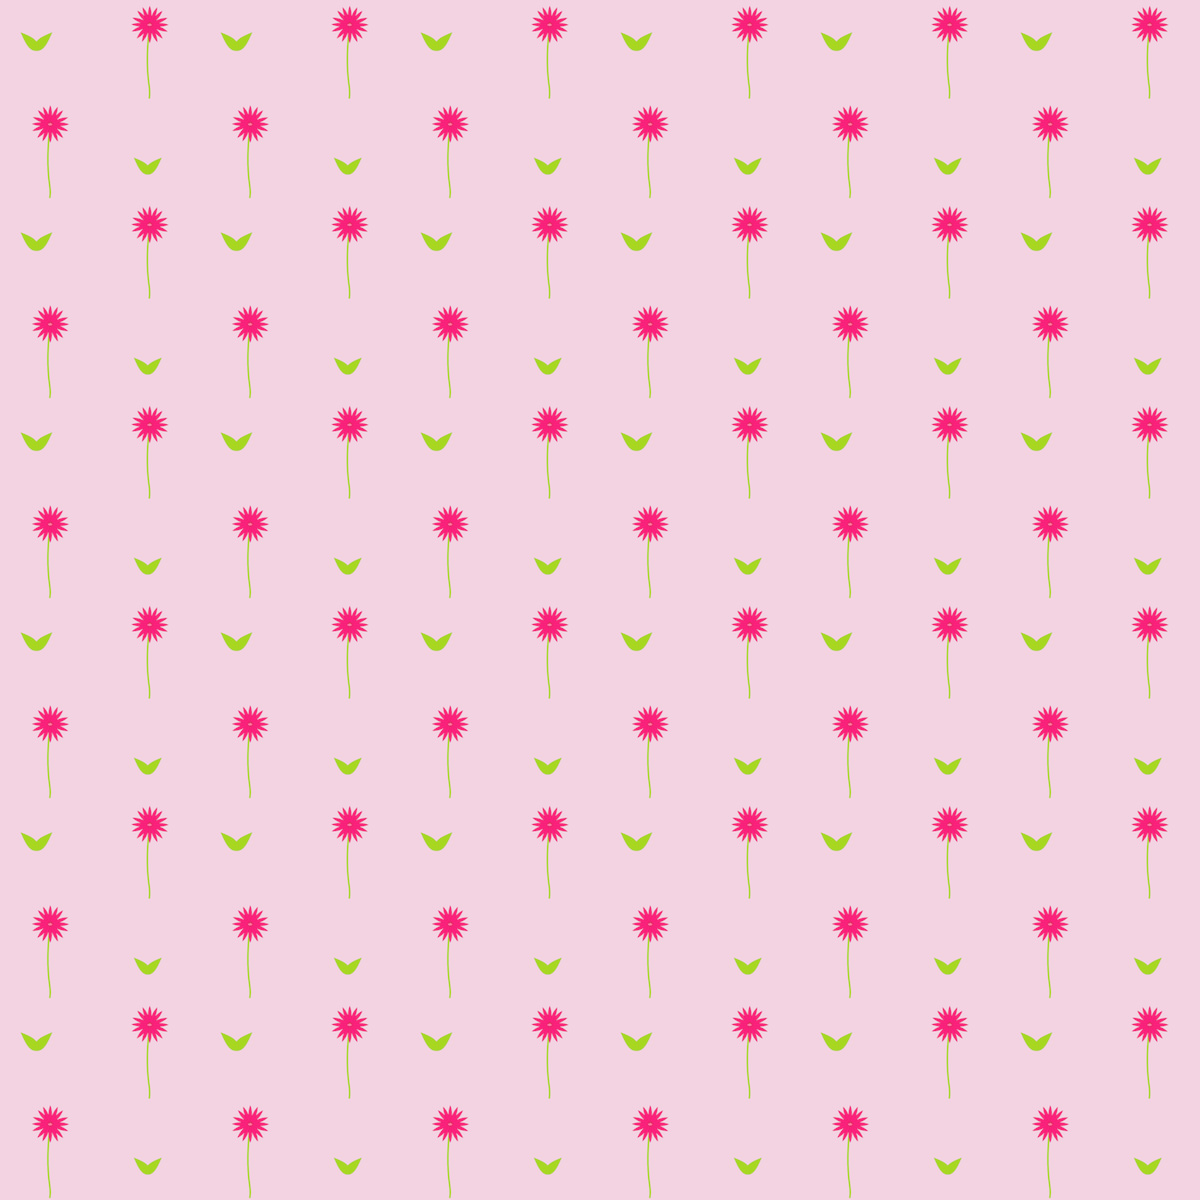 Wallpaper clipart pink Scrapbooking embellishment digital und Papier